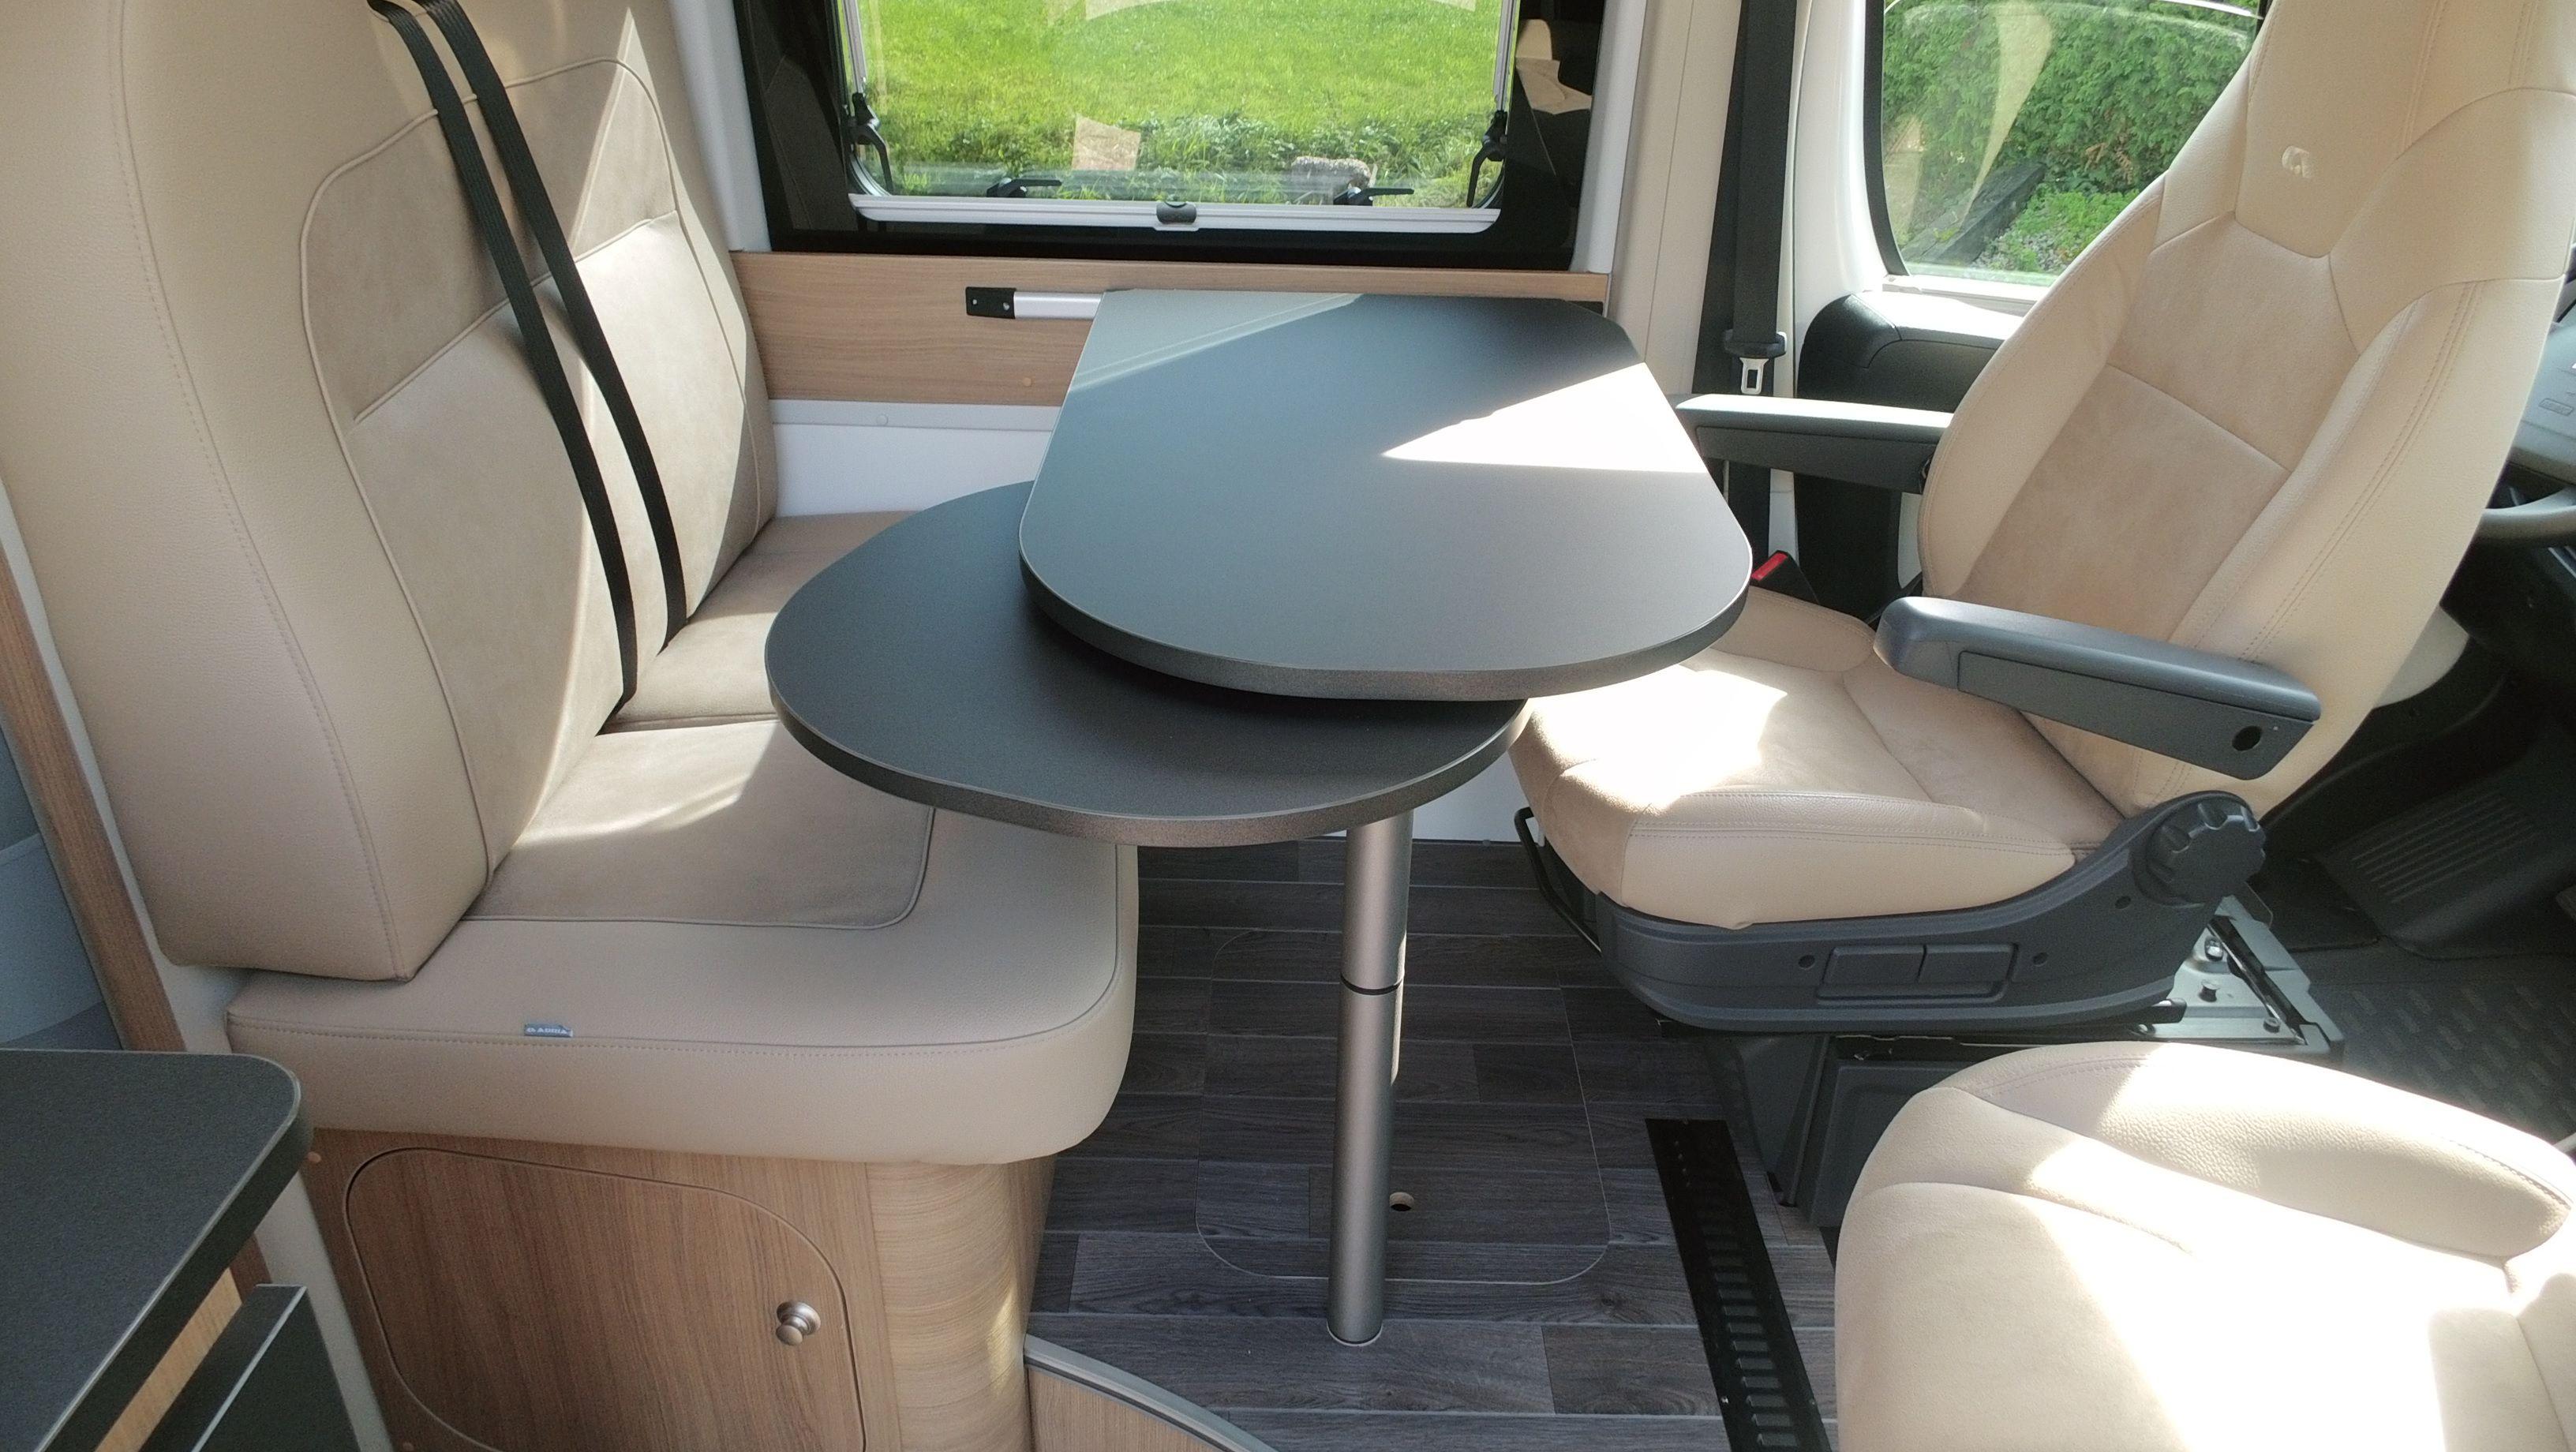 Fantastic Adria Twin Axess 600 Sp De Haan Campers Unemploymentrelief Wooden Chair Designs For Living Room Unemploymentrelieforg